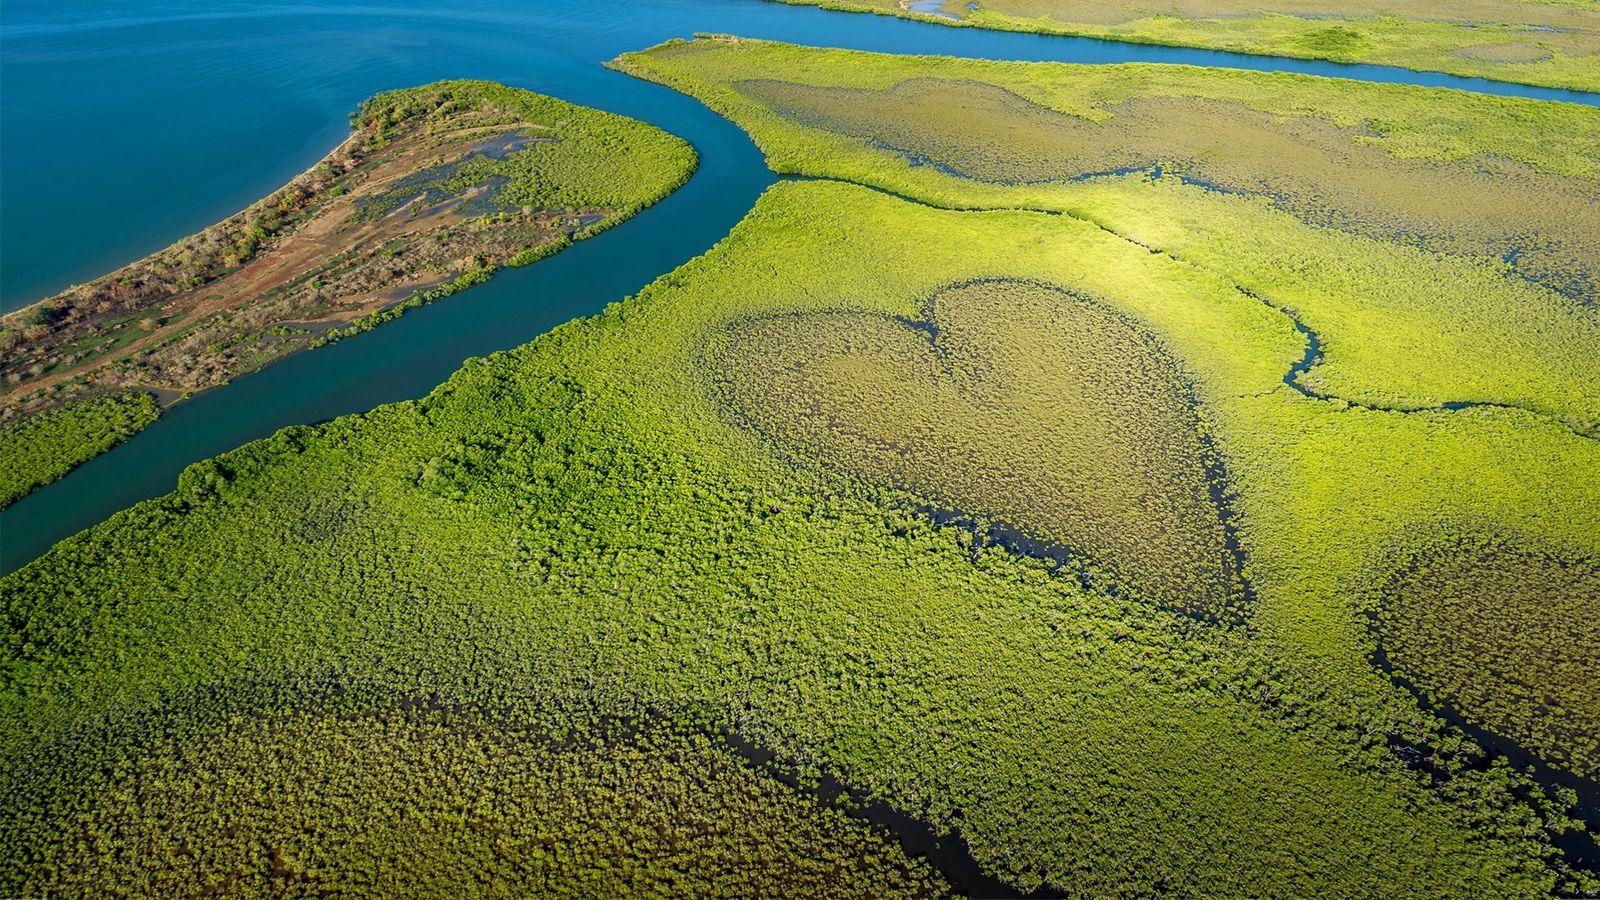 Mangrove de Voh if located in Nouvelle-Calédonie